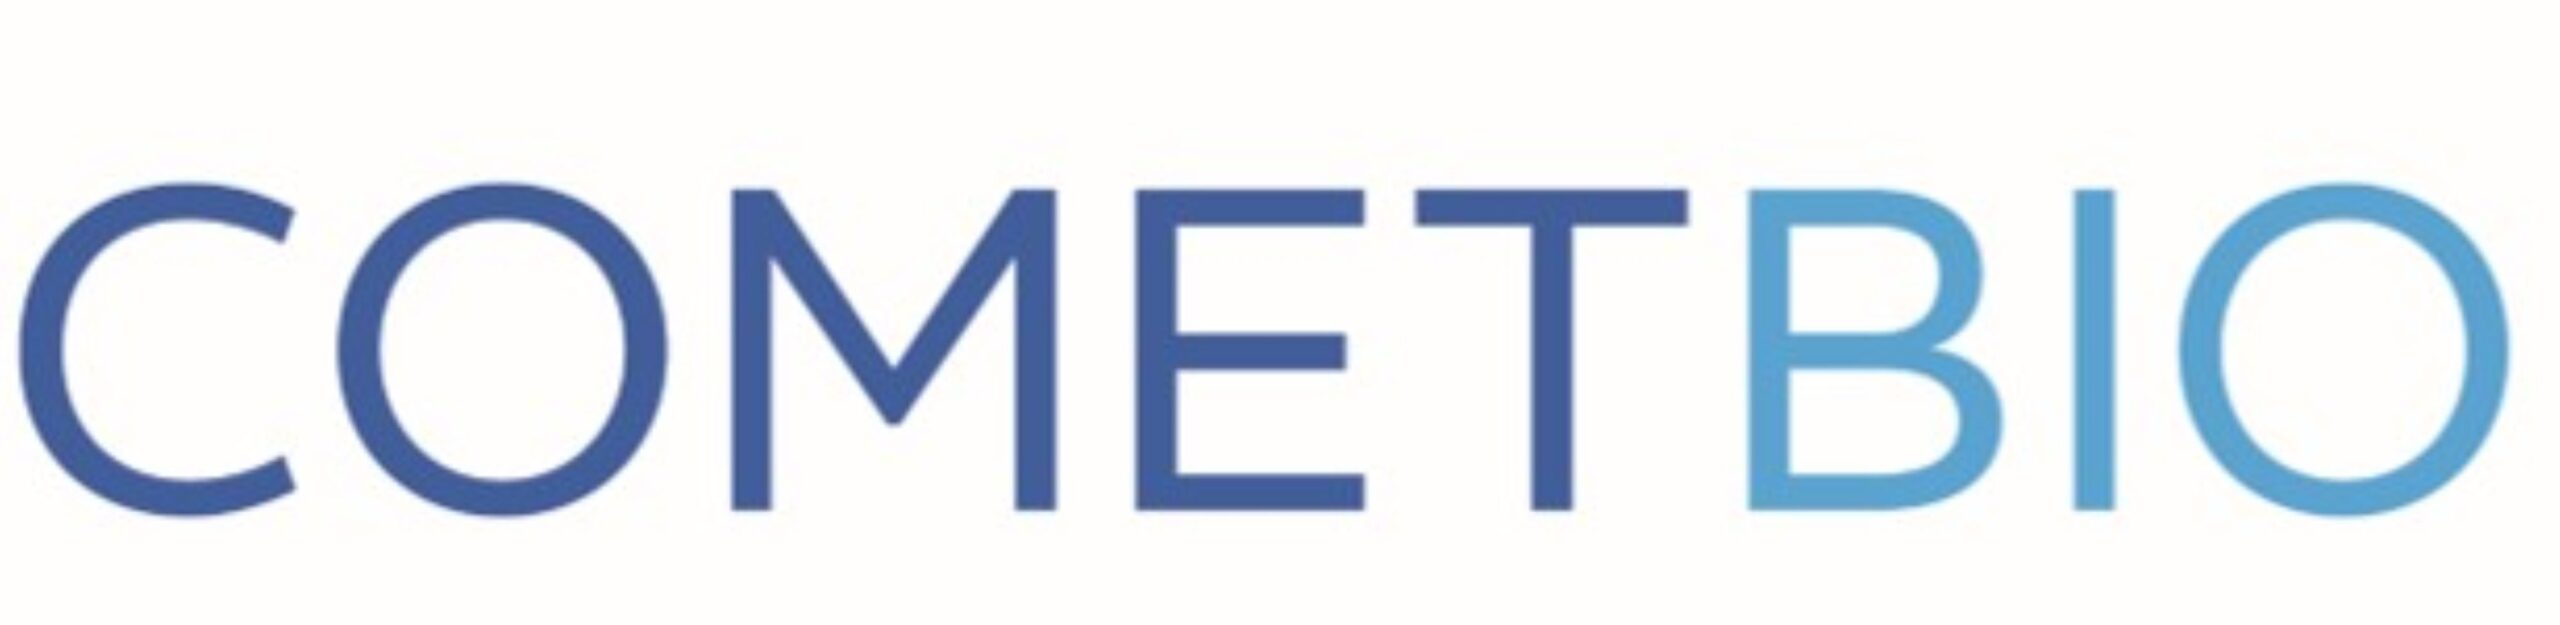 comet bio logo